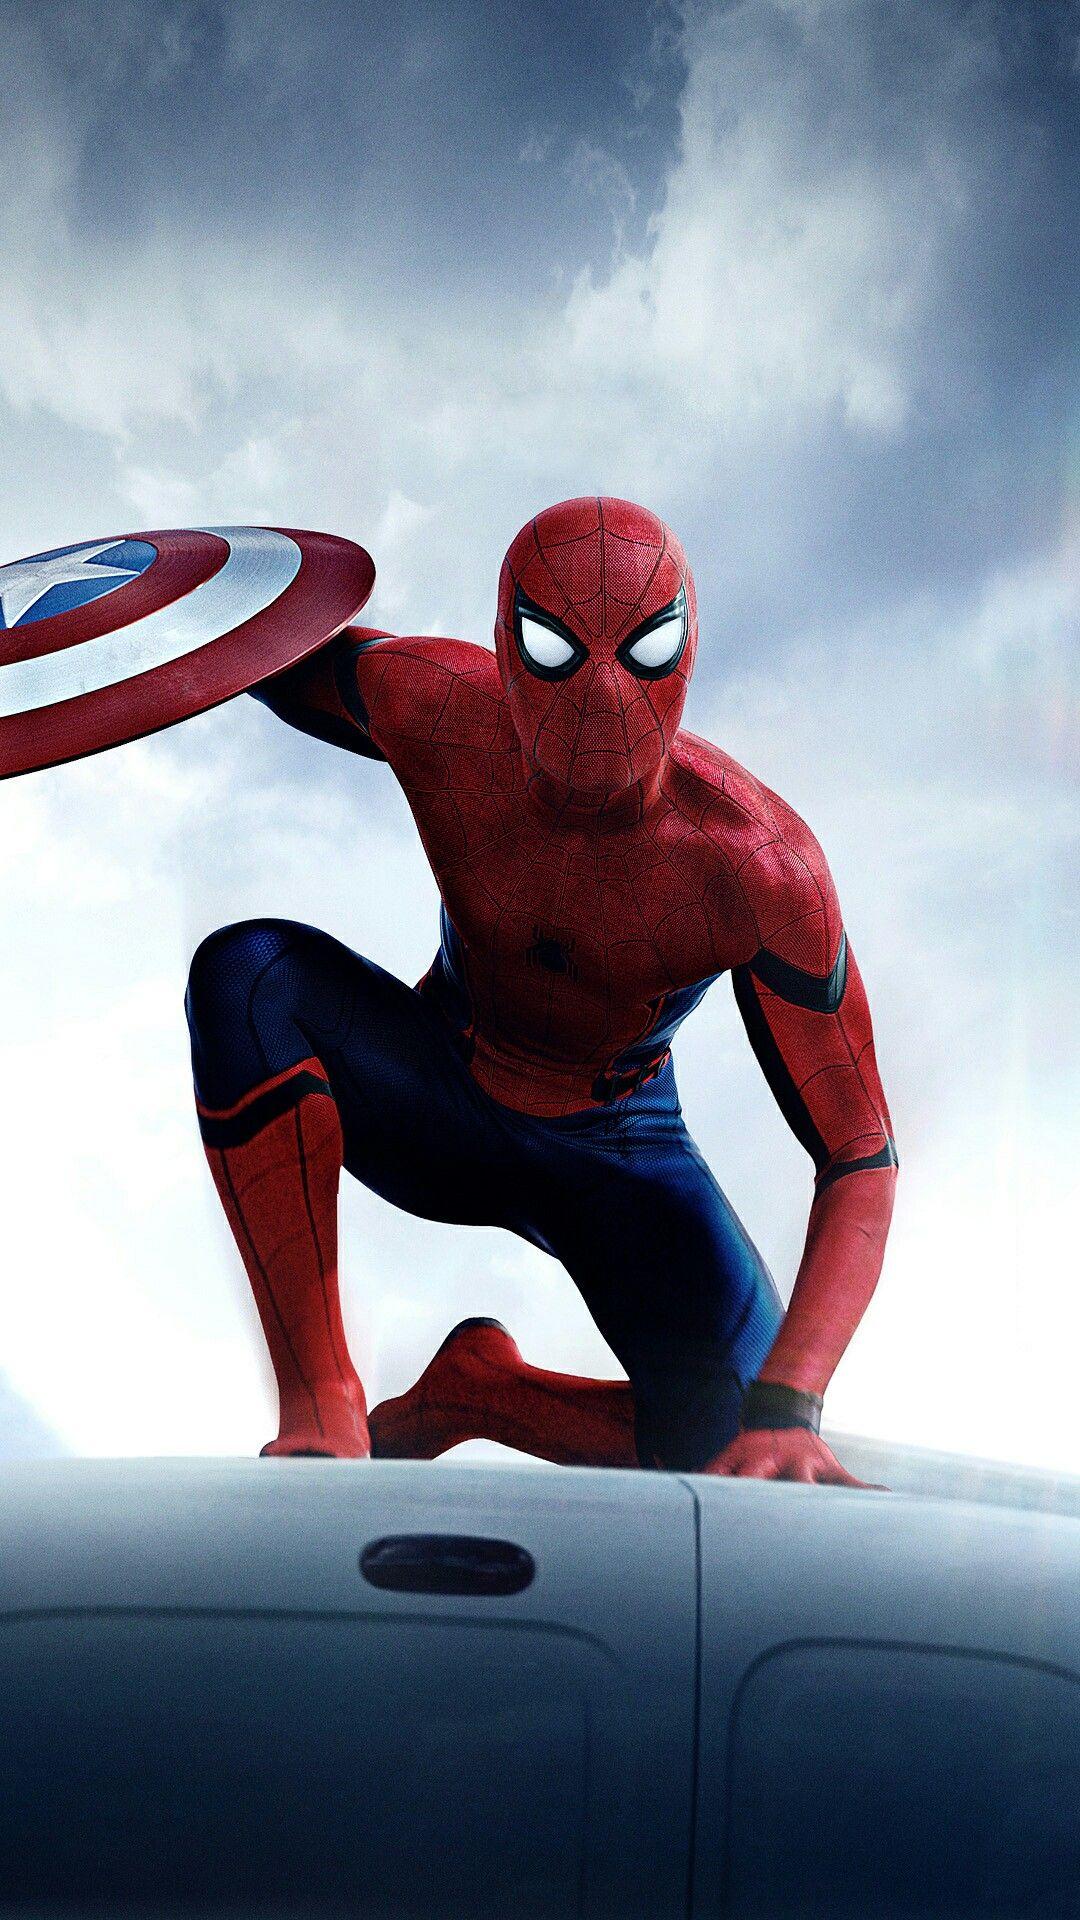 Pin by Juli Singh on Avengers stars Spiderman, Spiderman